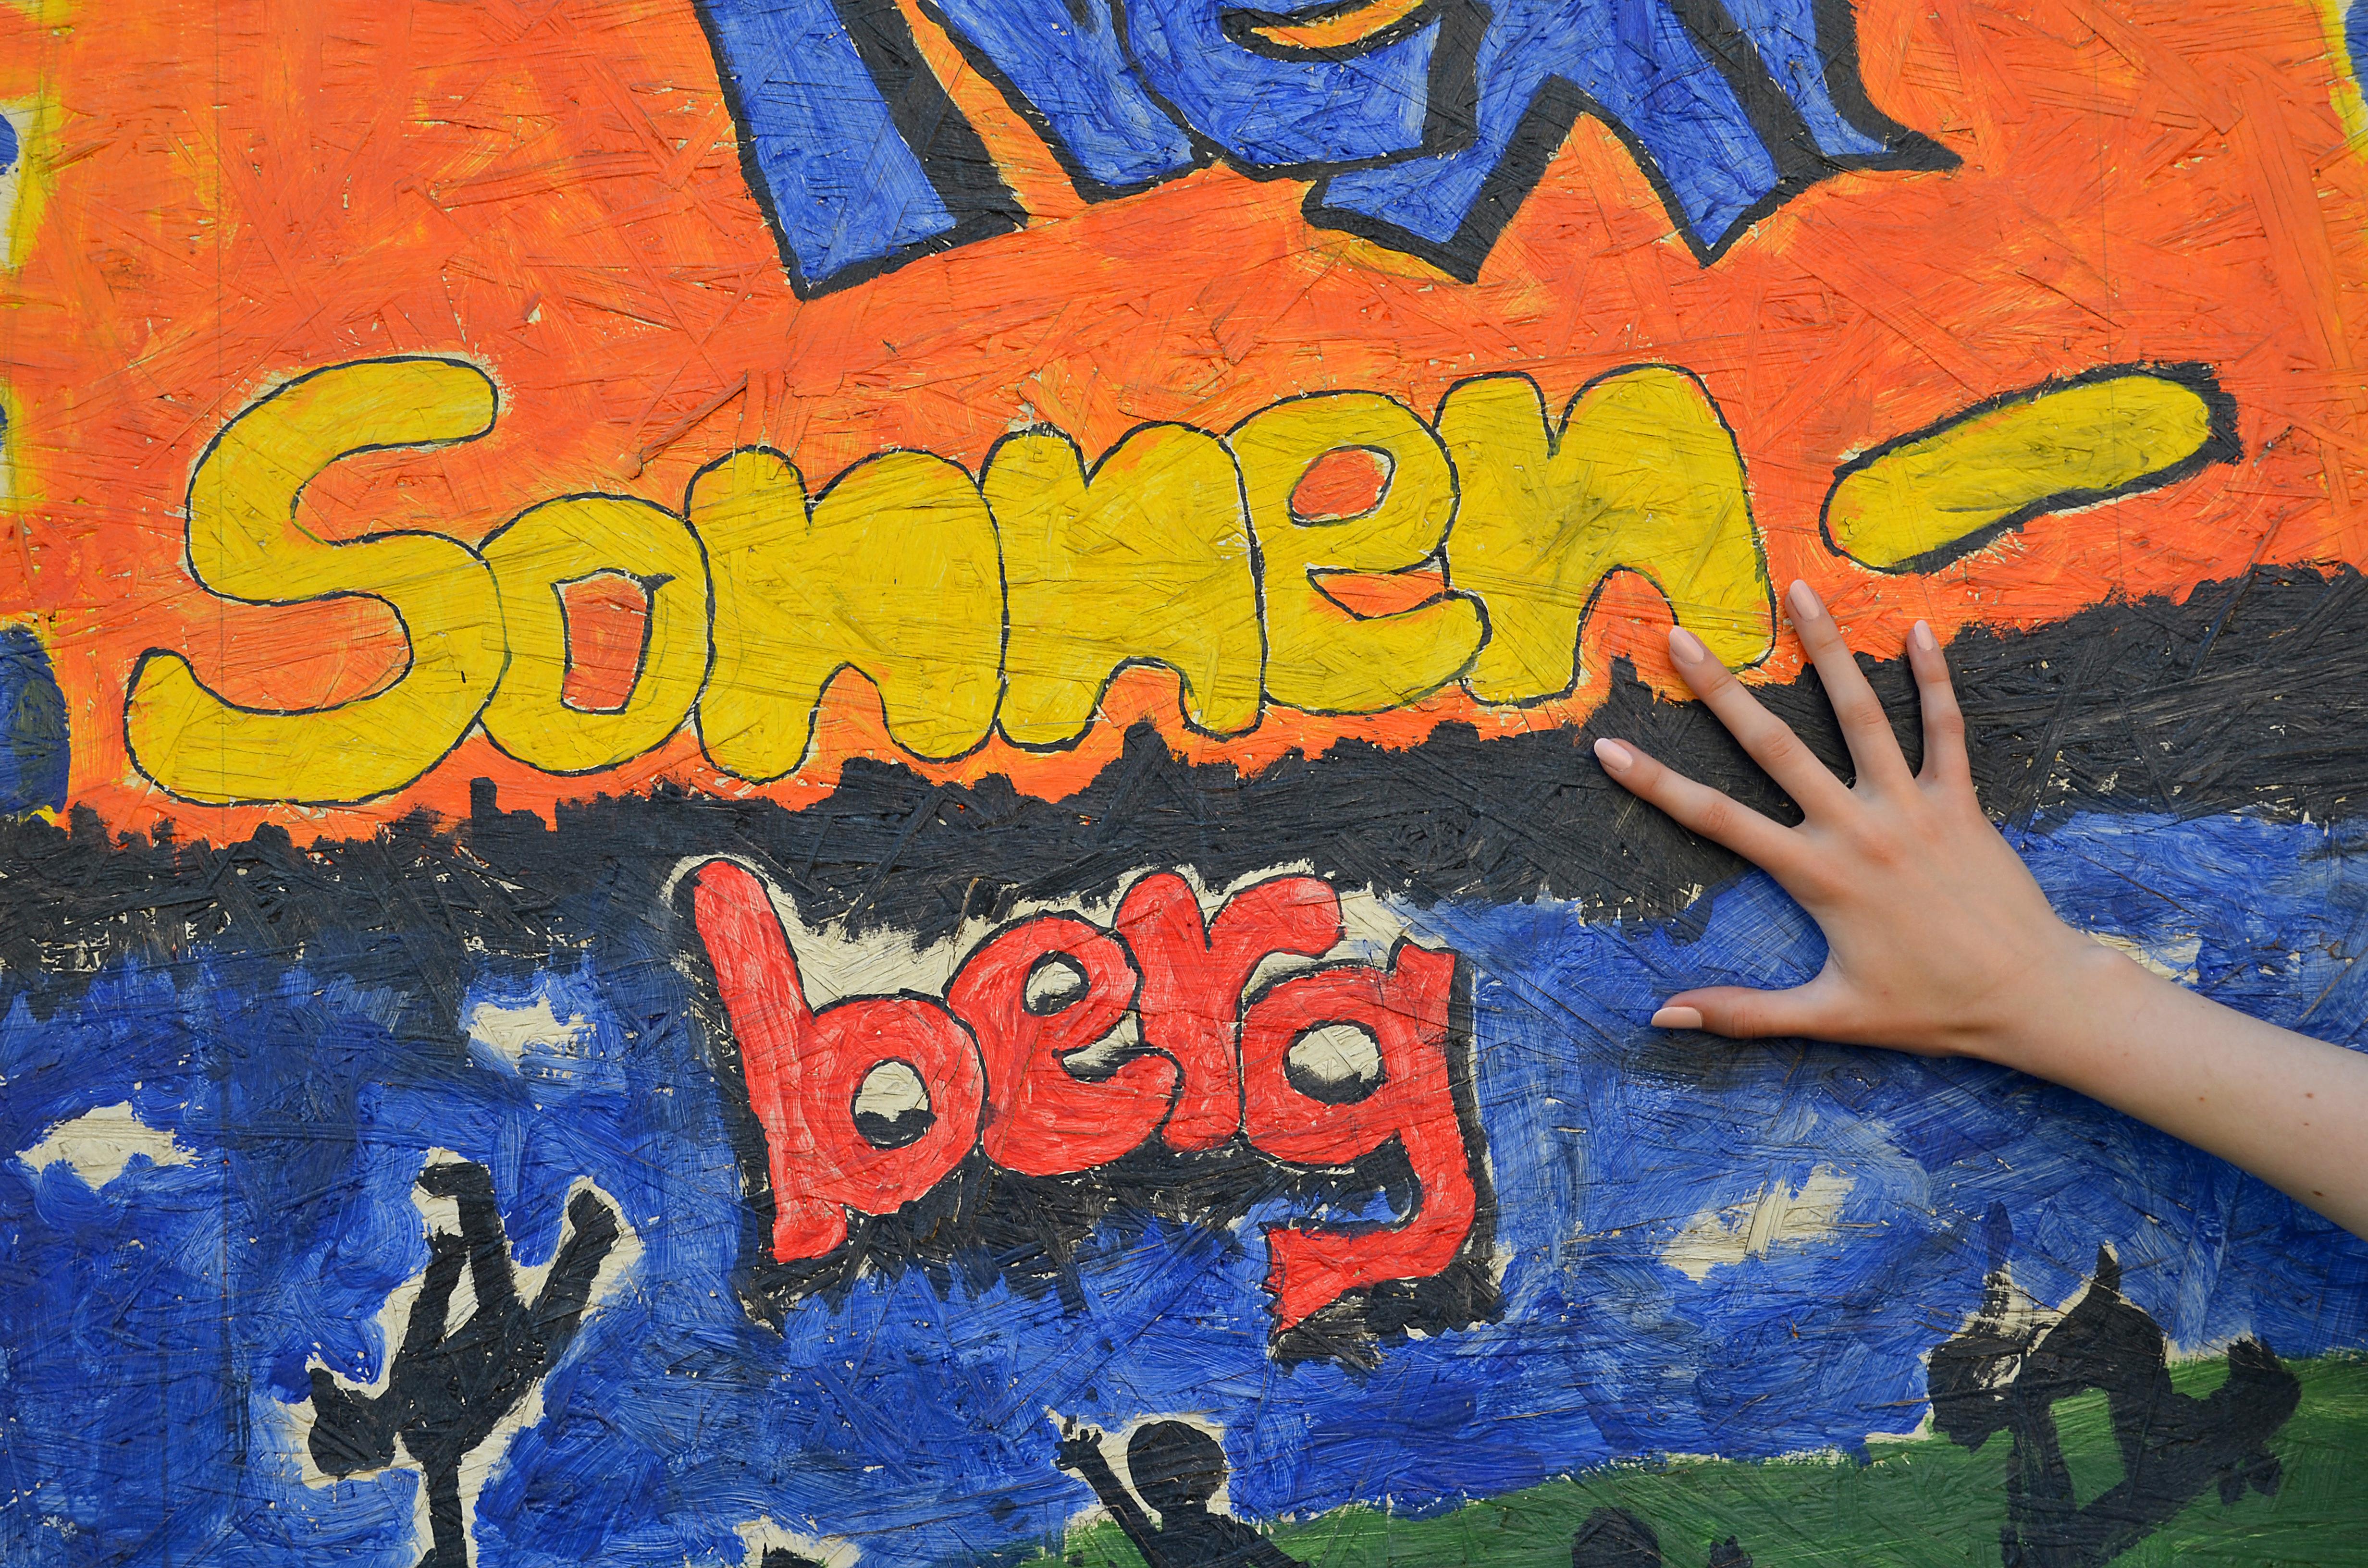 177e66a91022d2 File Chemnitz sonnenberg outdoor galerie hand.JPG - Wikimedia Commons